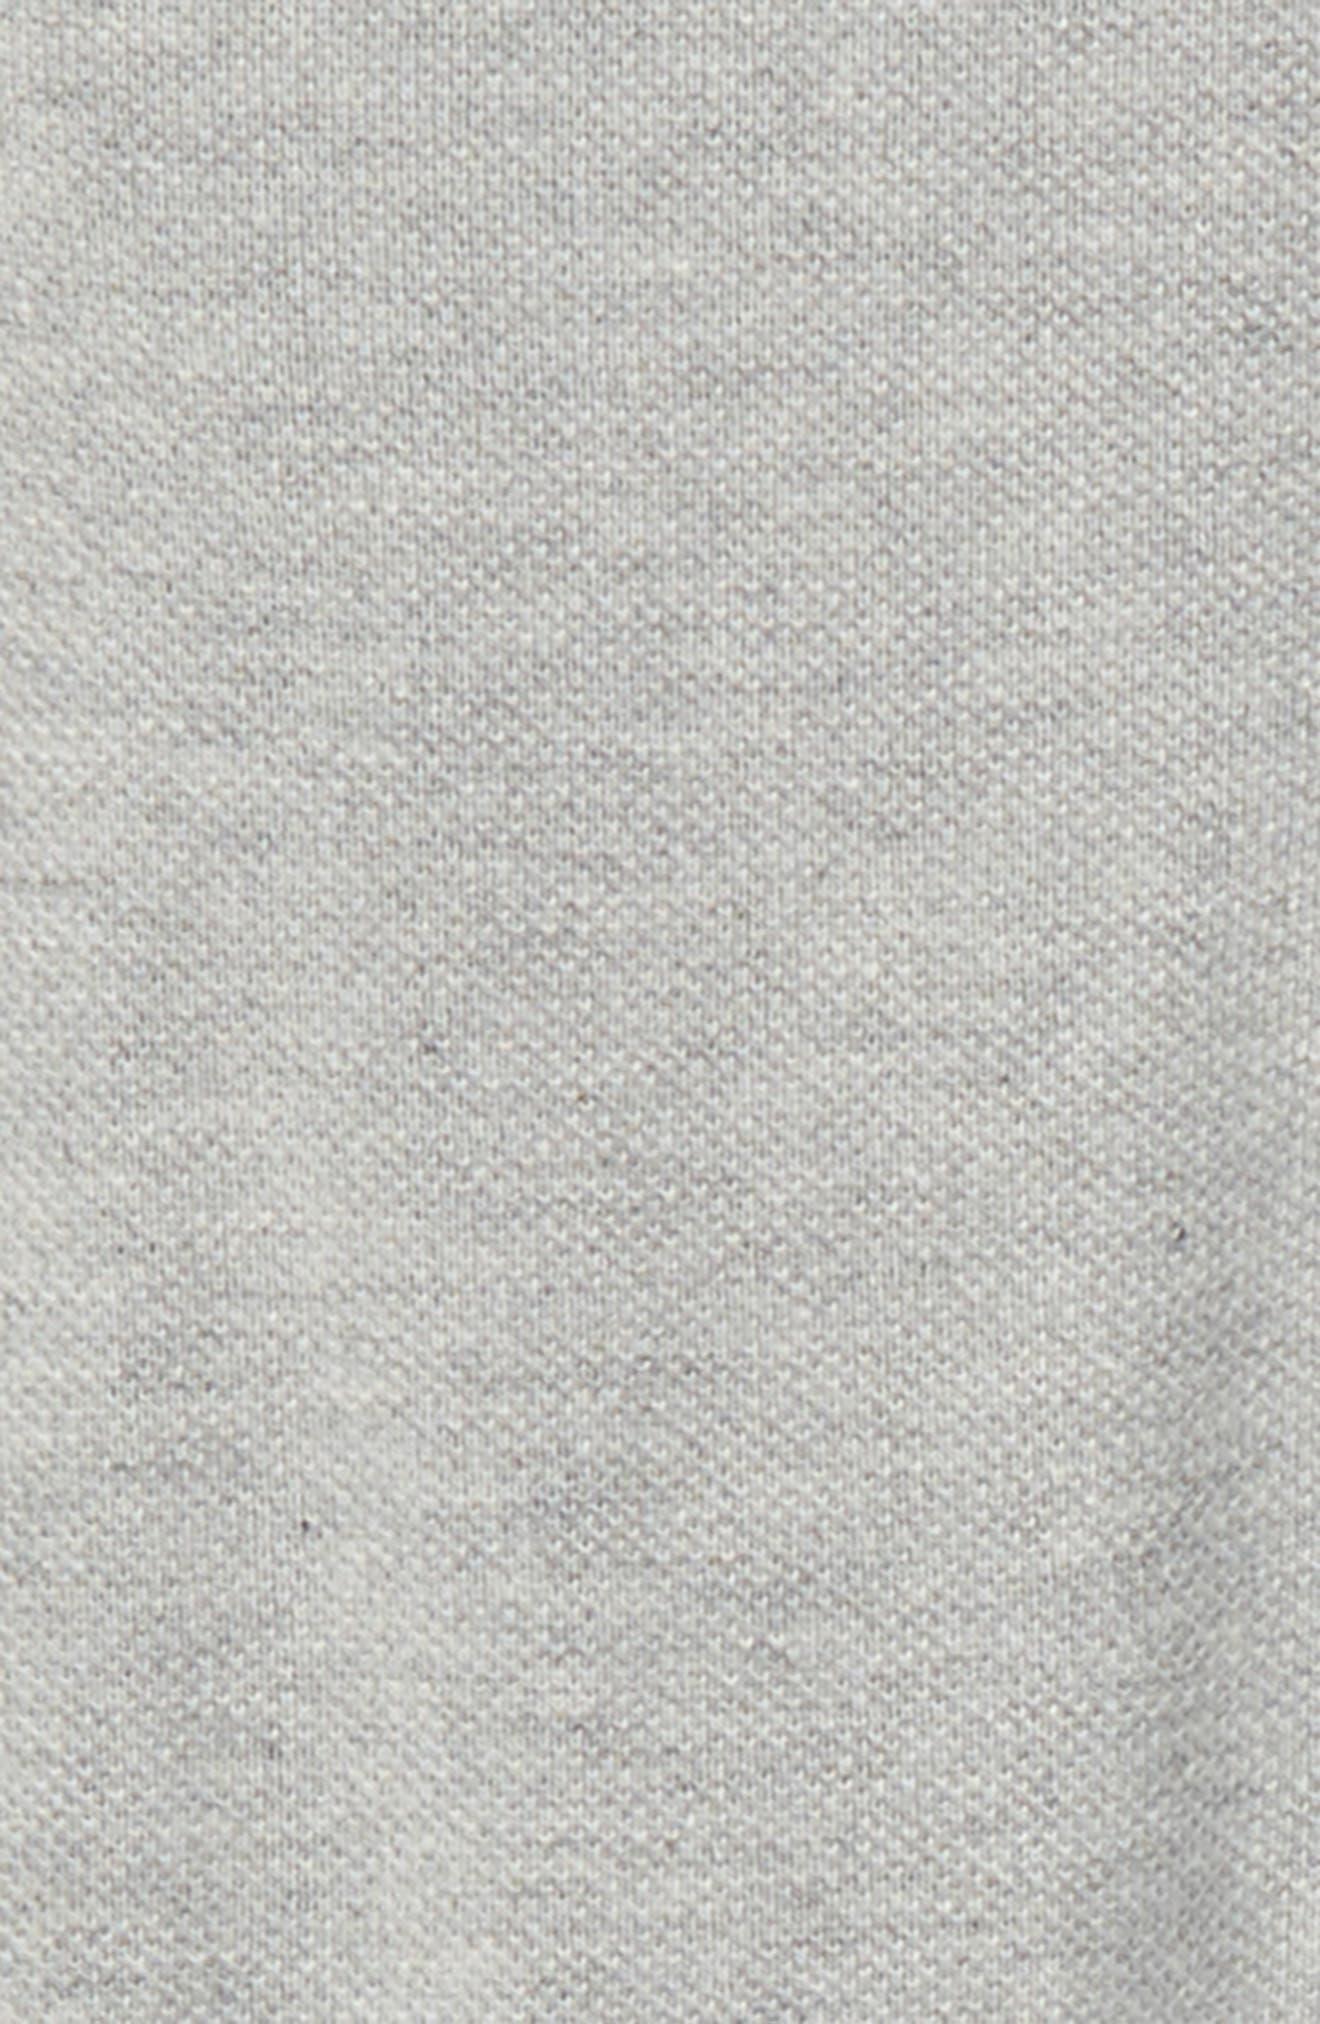 Check Collar Polo,                             Alternate thumbnail 2, color,                             Pale Grey Melange